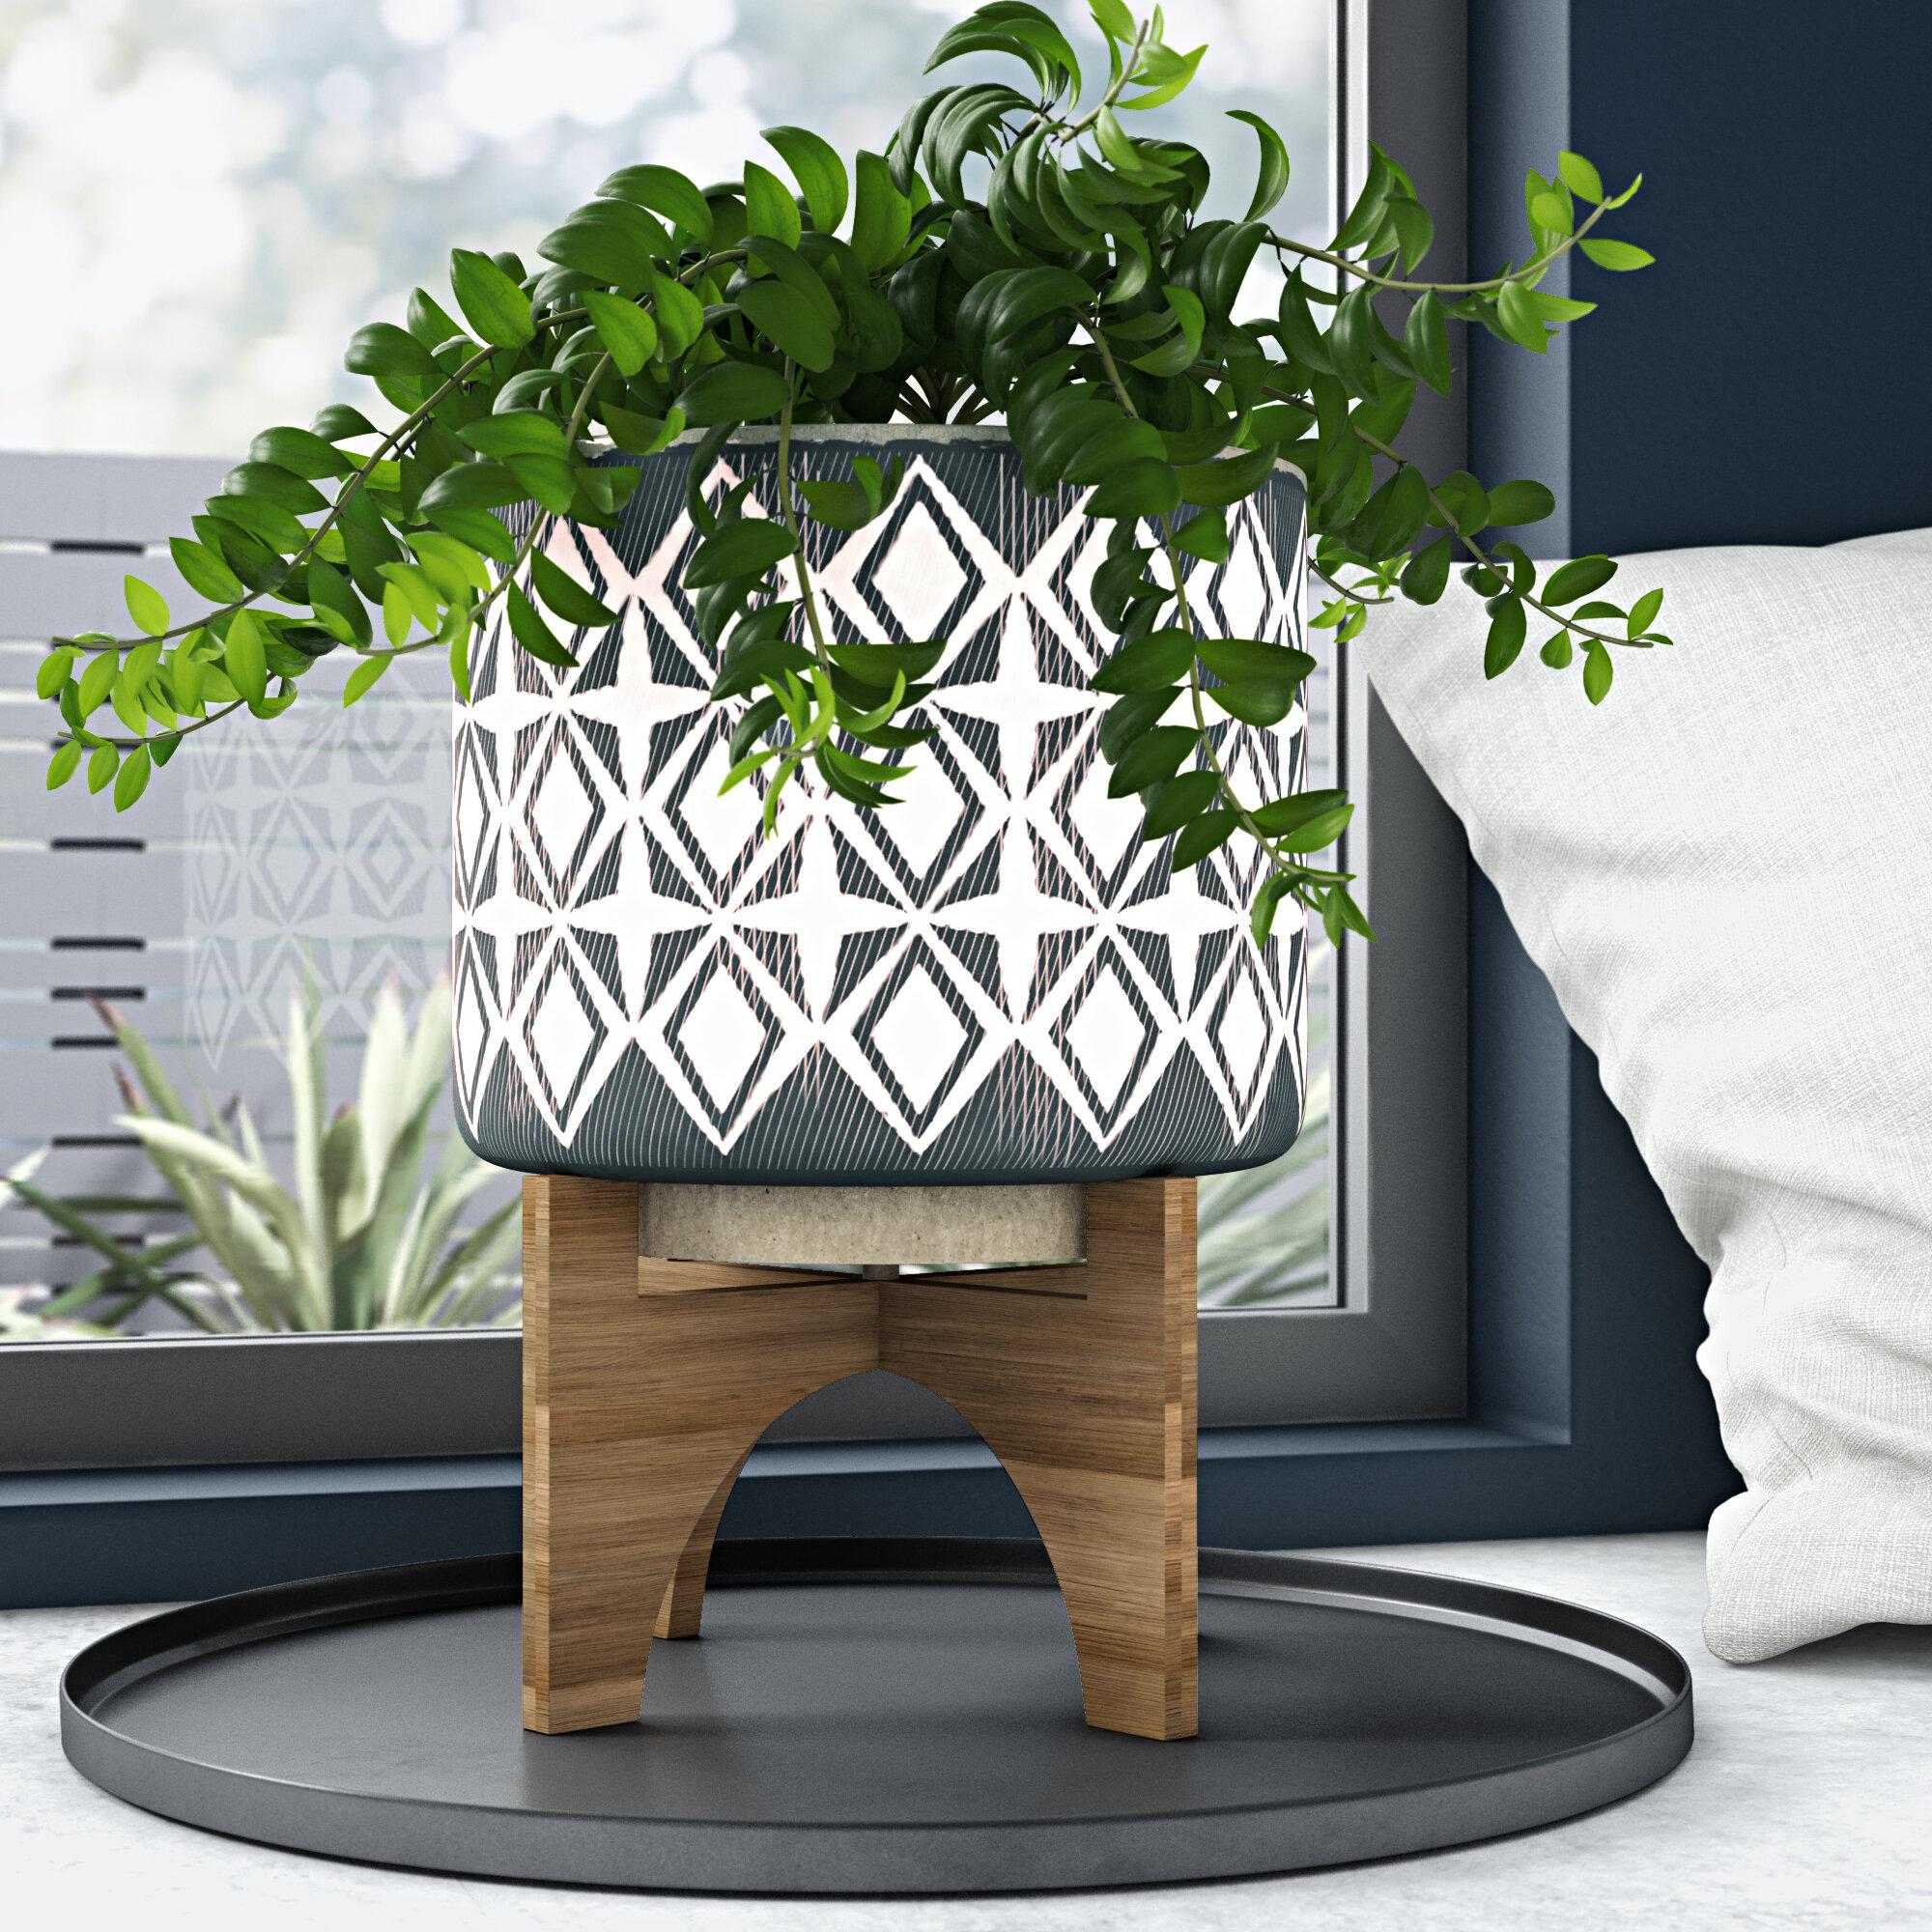 Abdera Ceramic Pot Planter Reviews Allmodern